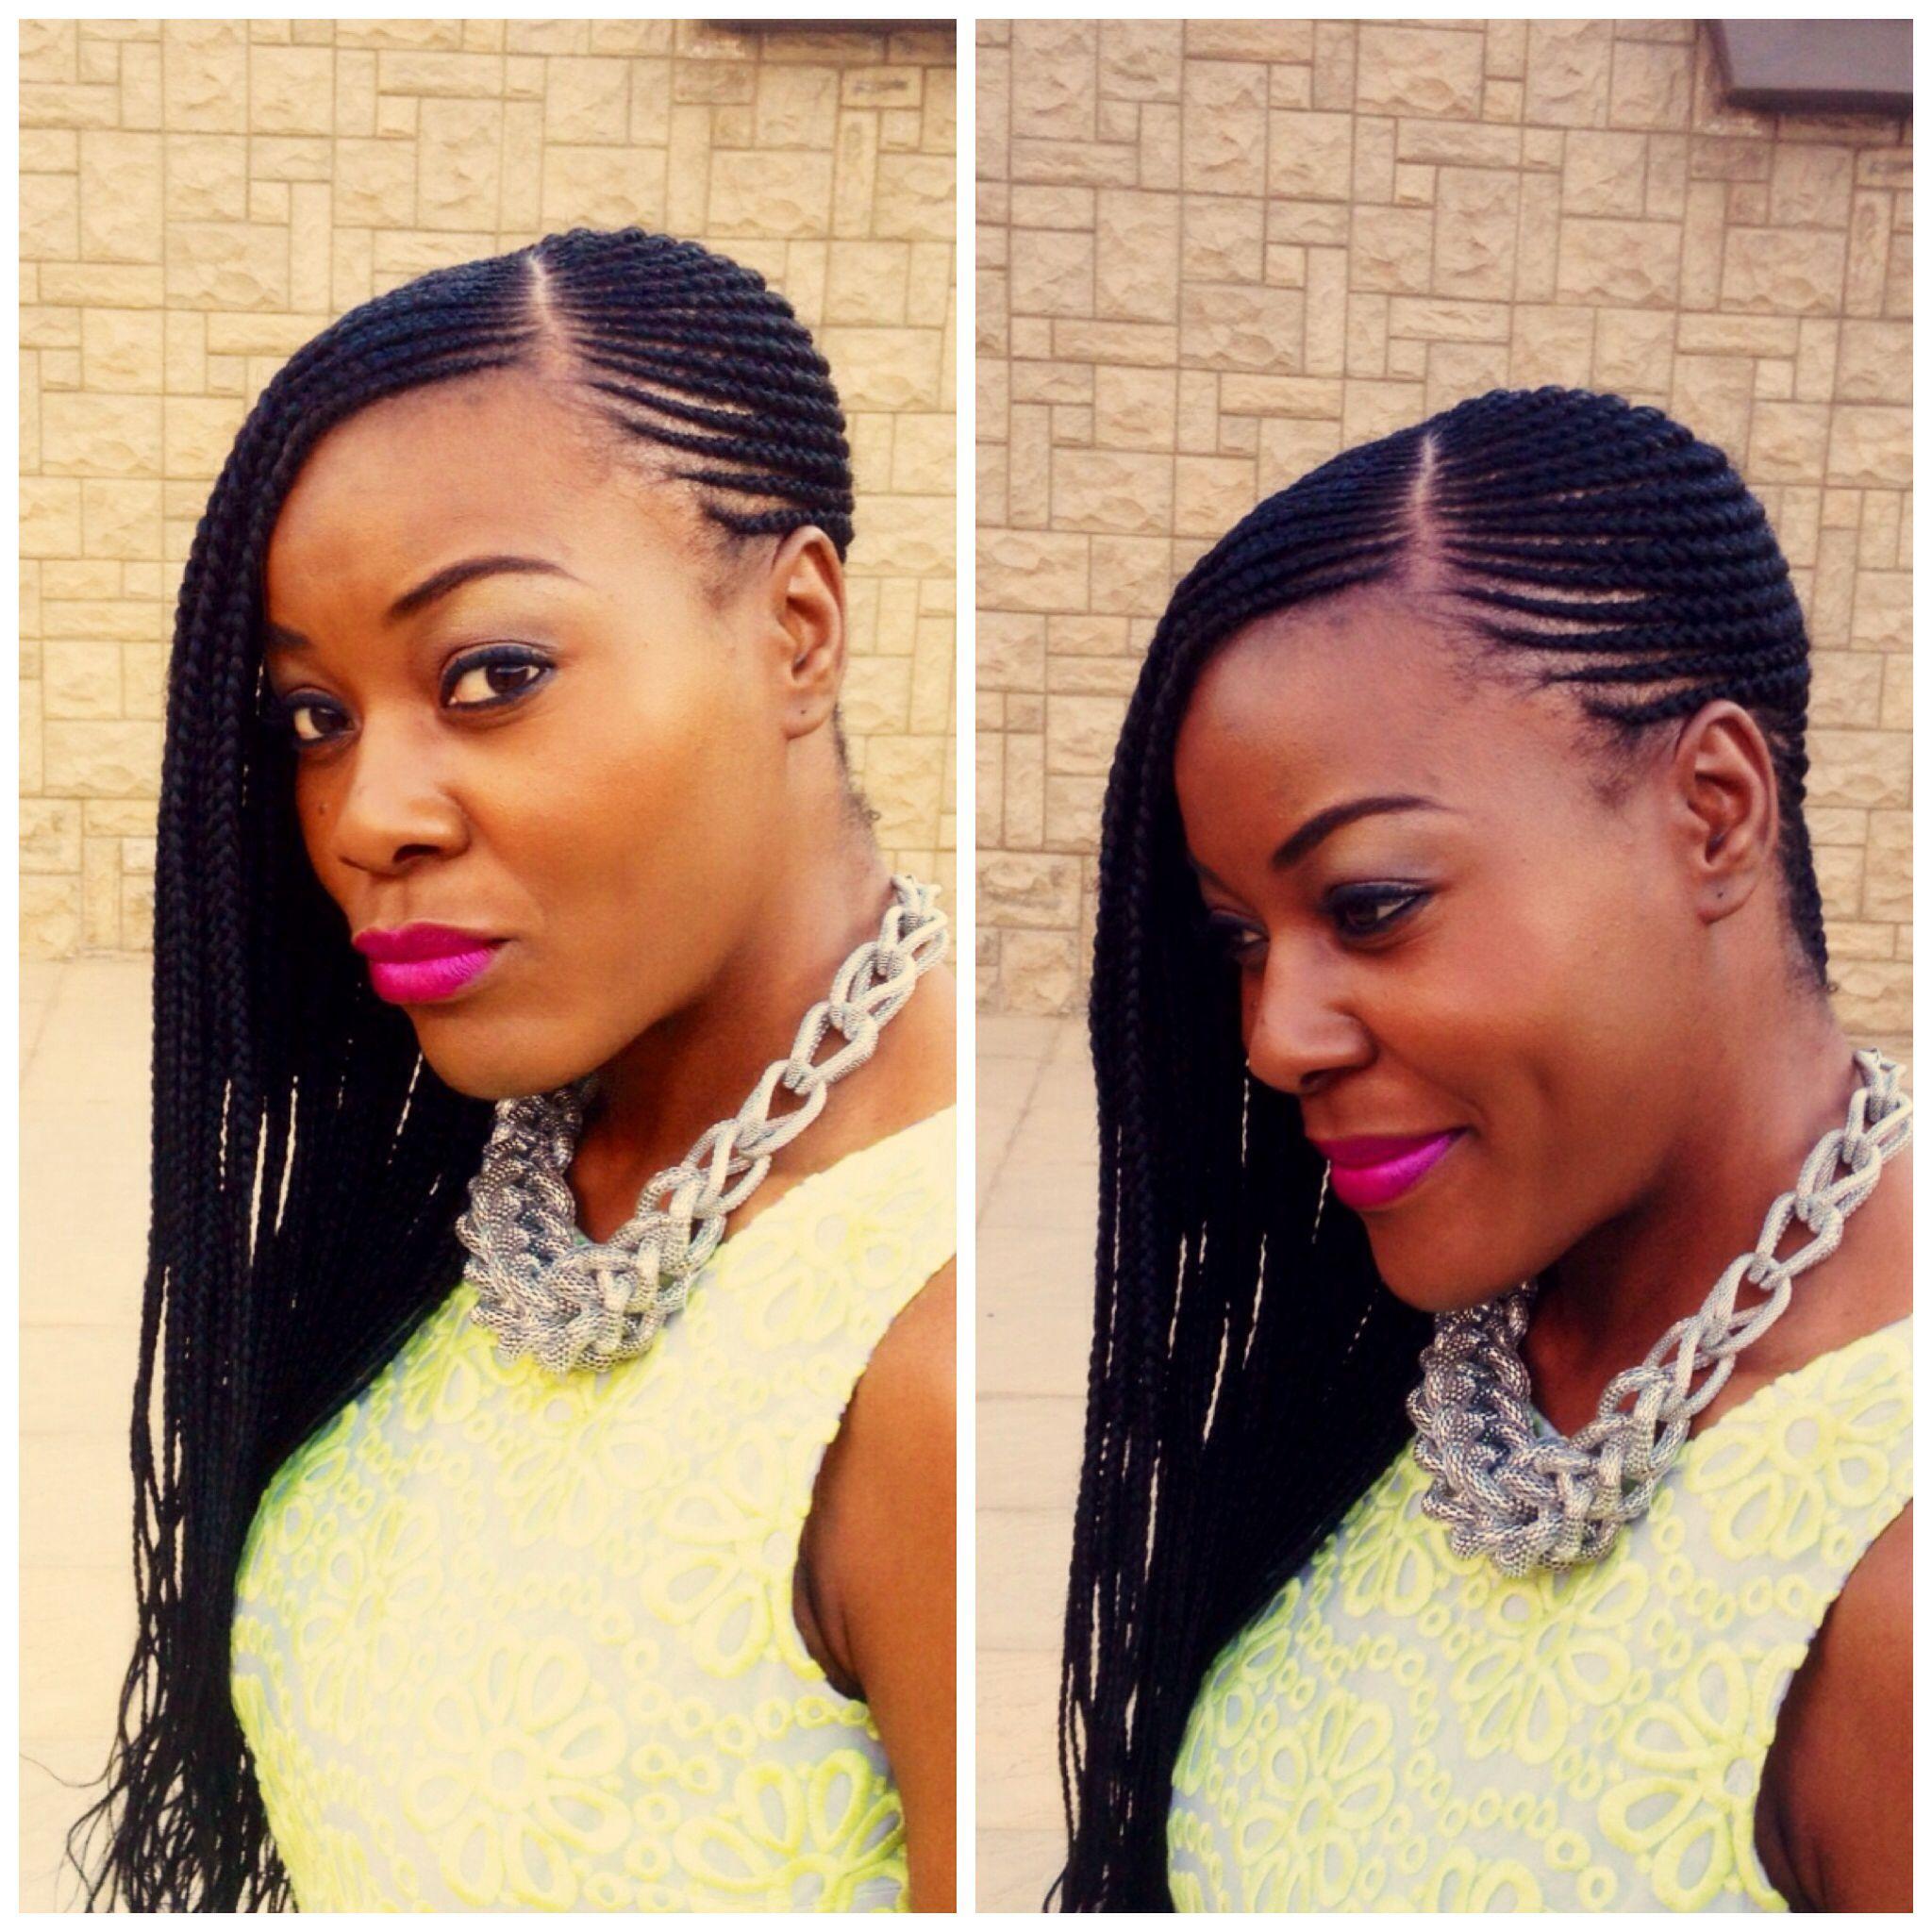 Ghanaian Bridal Styling With Straight Hair: Ghana Braid, #braids ~African Fashion, Ankara, Kitenge